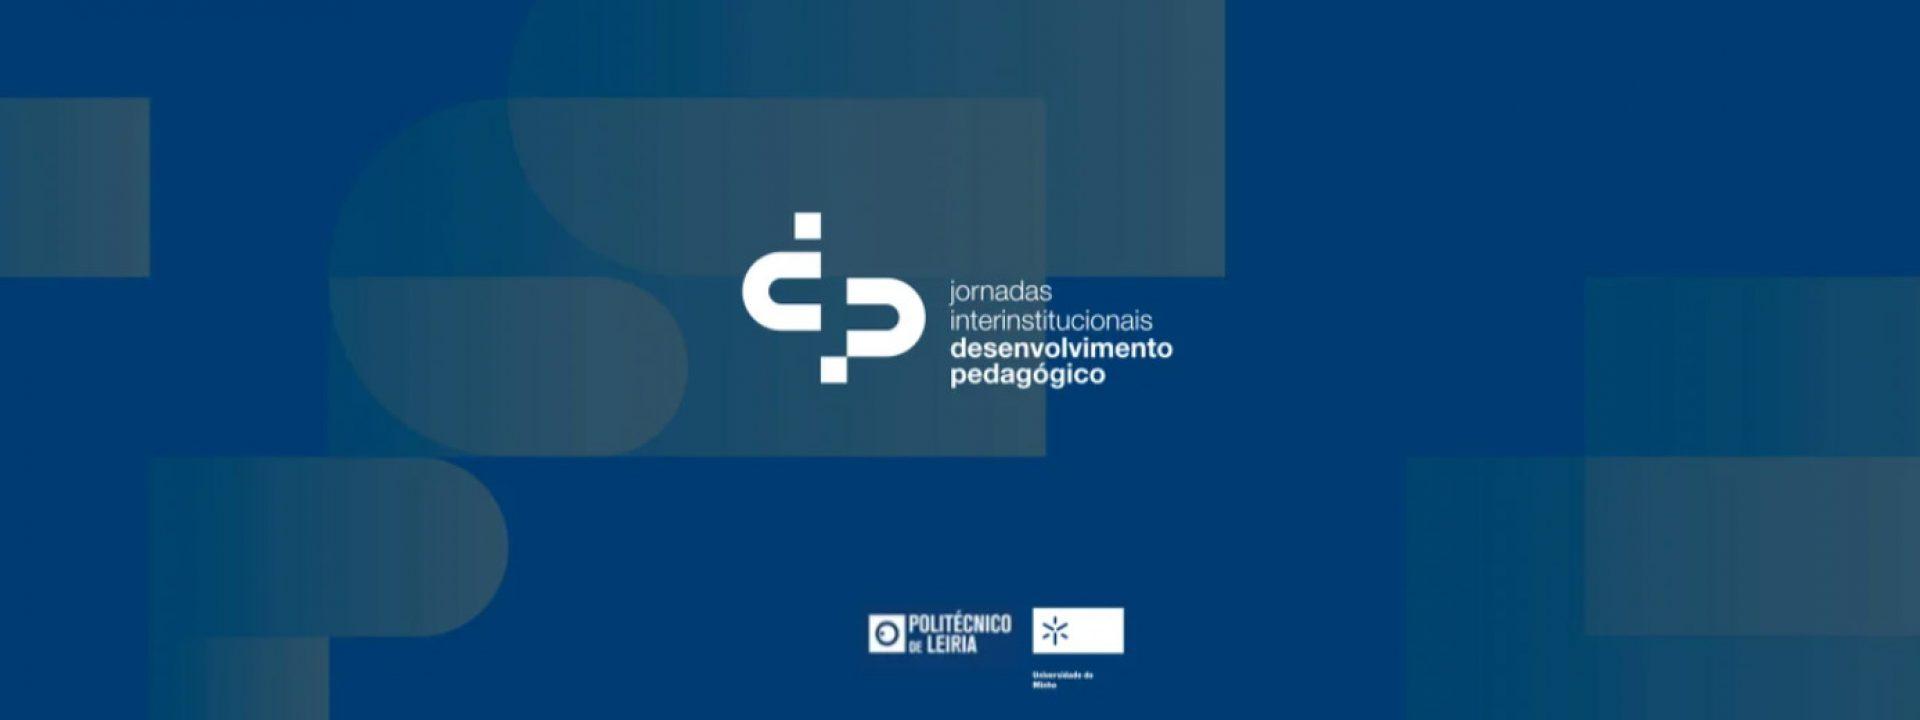 Jornadas Interinstuticionais Desenvolvimento Pedagógico